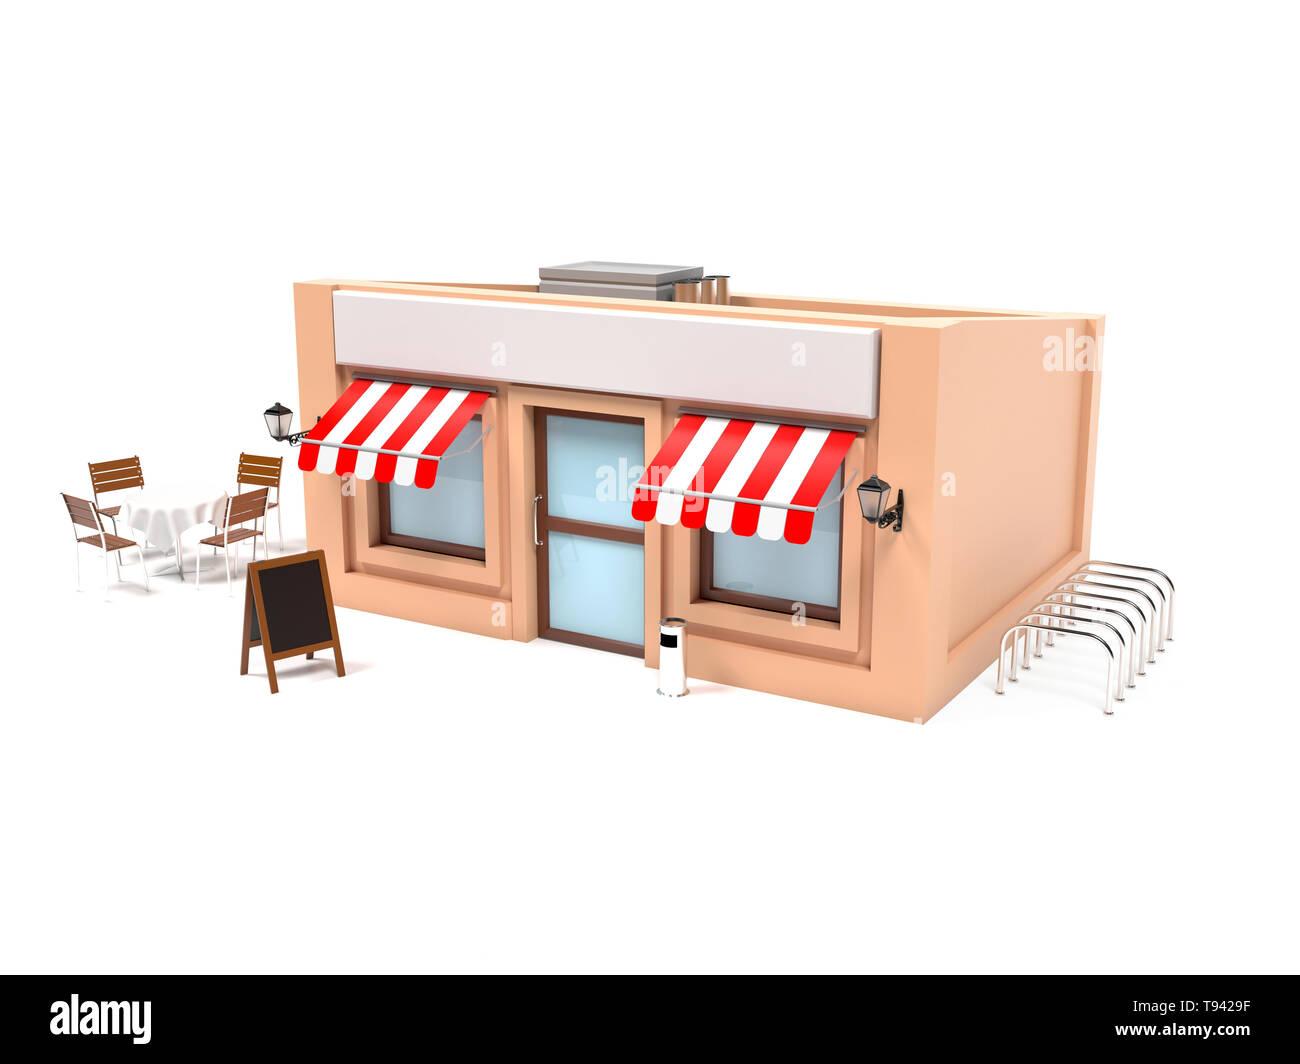 Market store complete exterior design. 3d rendering illustration - Stock Image